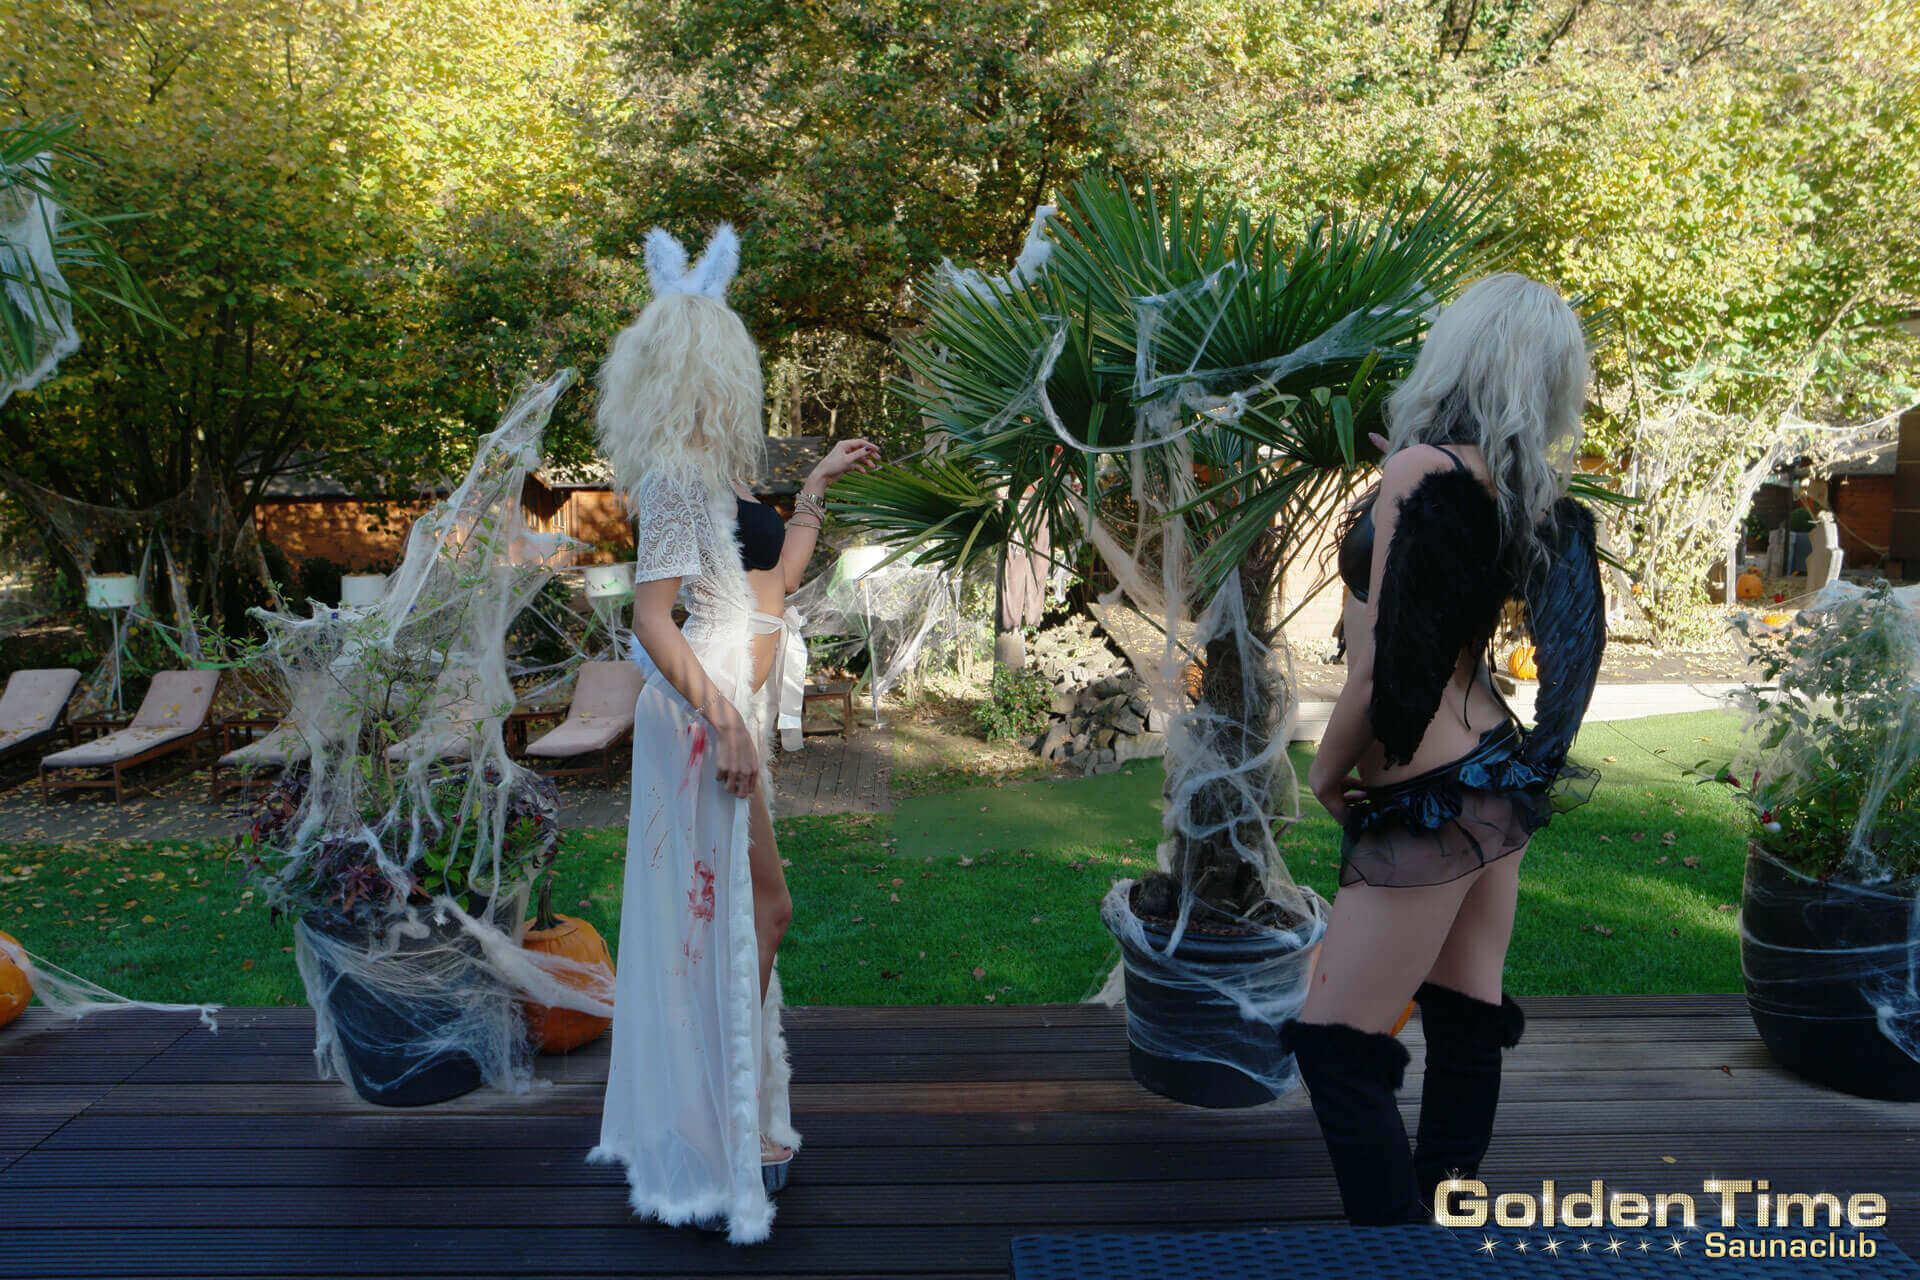 03-halloween-2016-goldentime-saunaclub-18.jpg